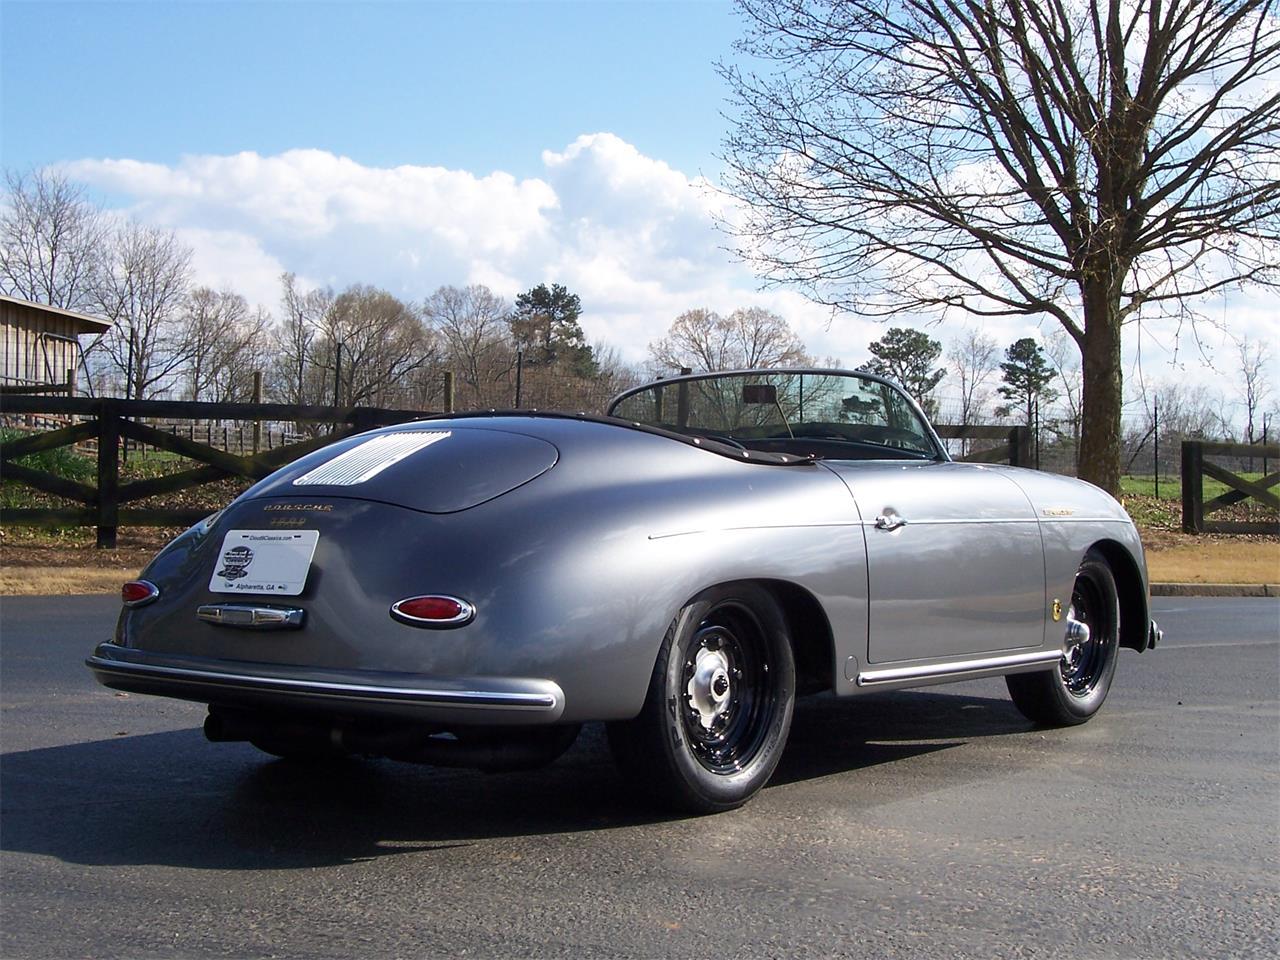 1957 Porsche 356 (CC-1199902) for sale in Alpharetta, Georgia